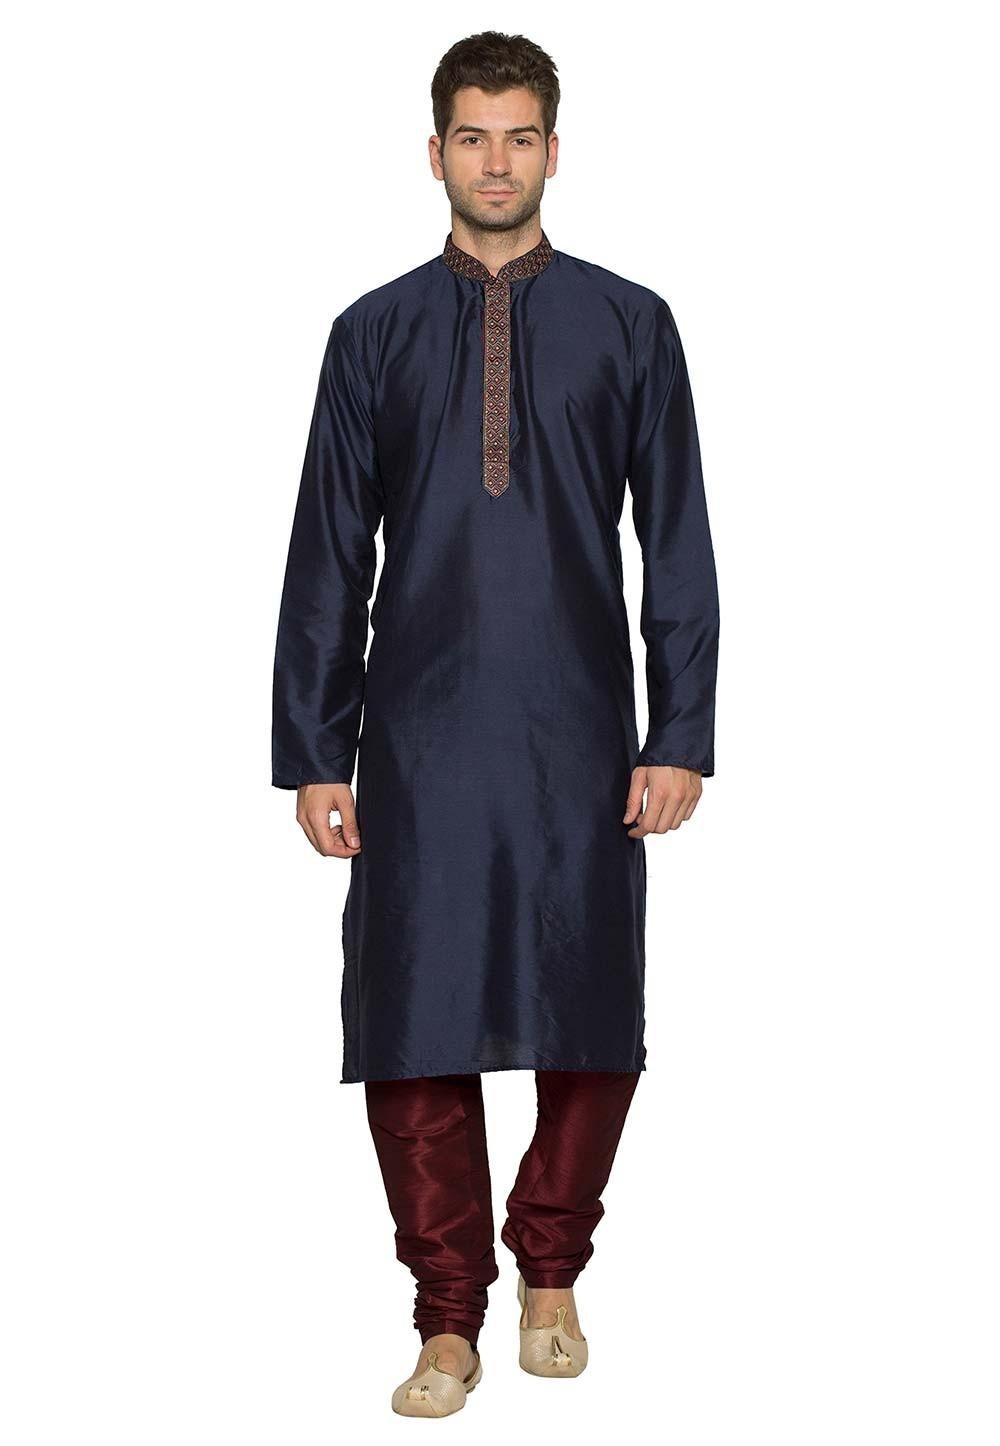 Blue Colour Party Wear Kurta Pyjama.